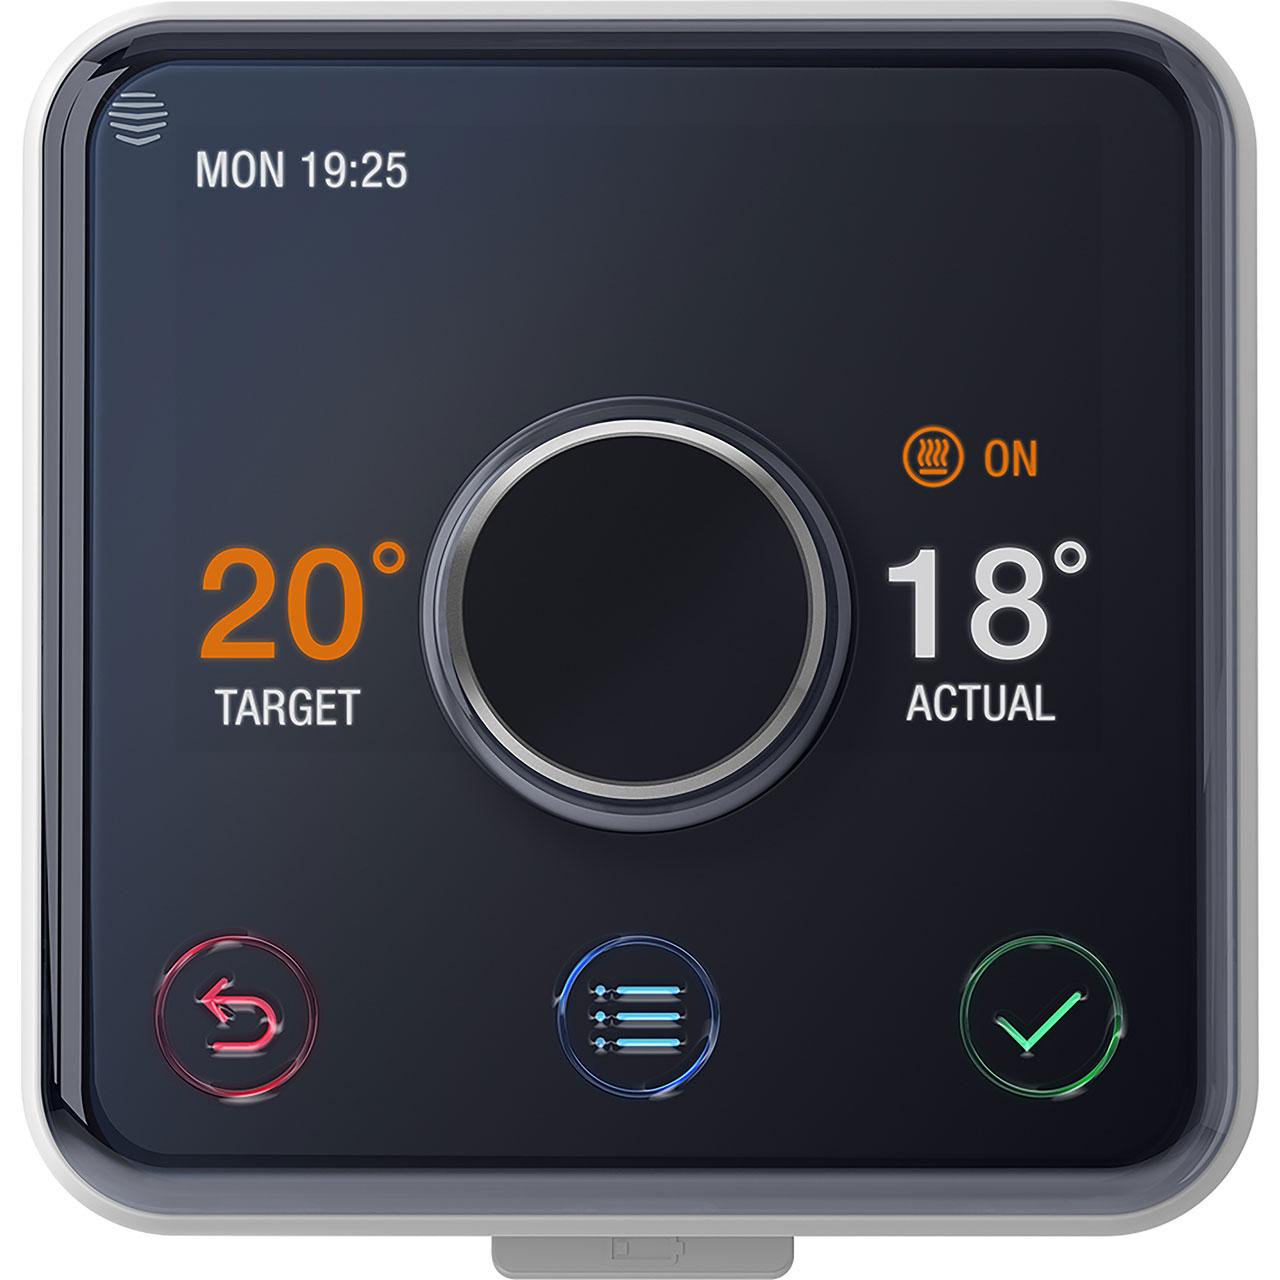 Hive Smart Thermostat plus AO Installation - £179 plus claim £20 cashback!